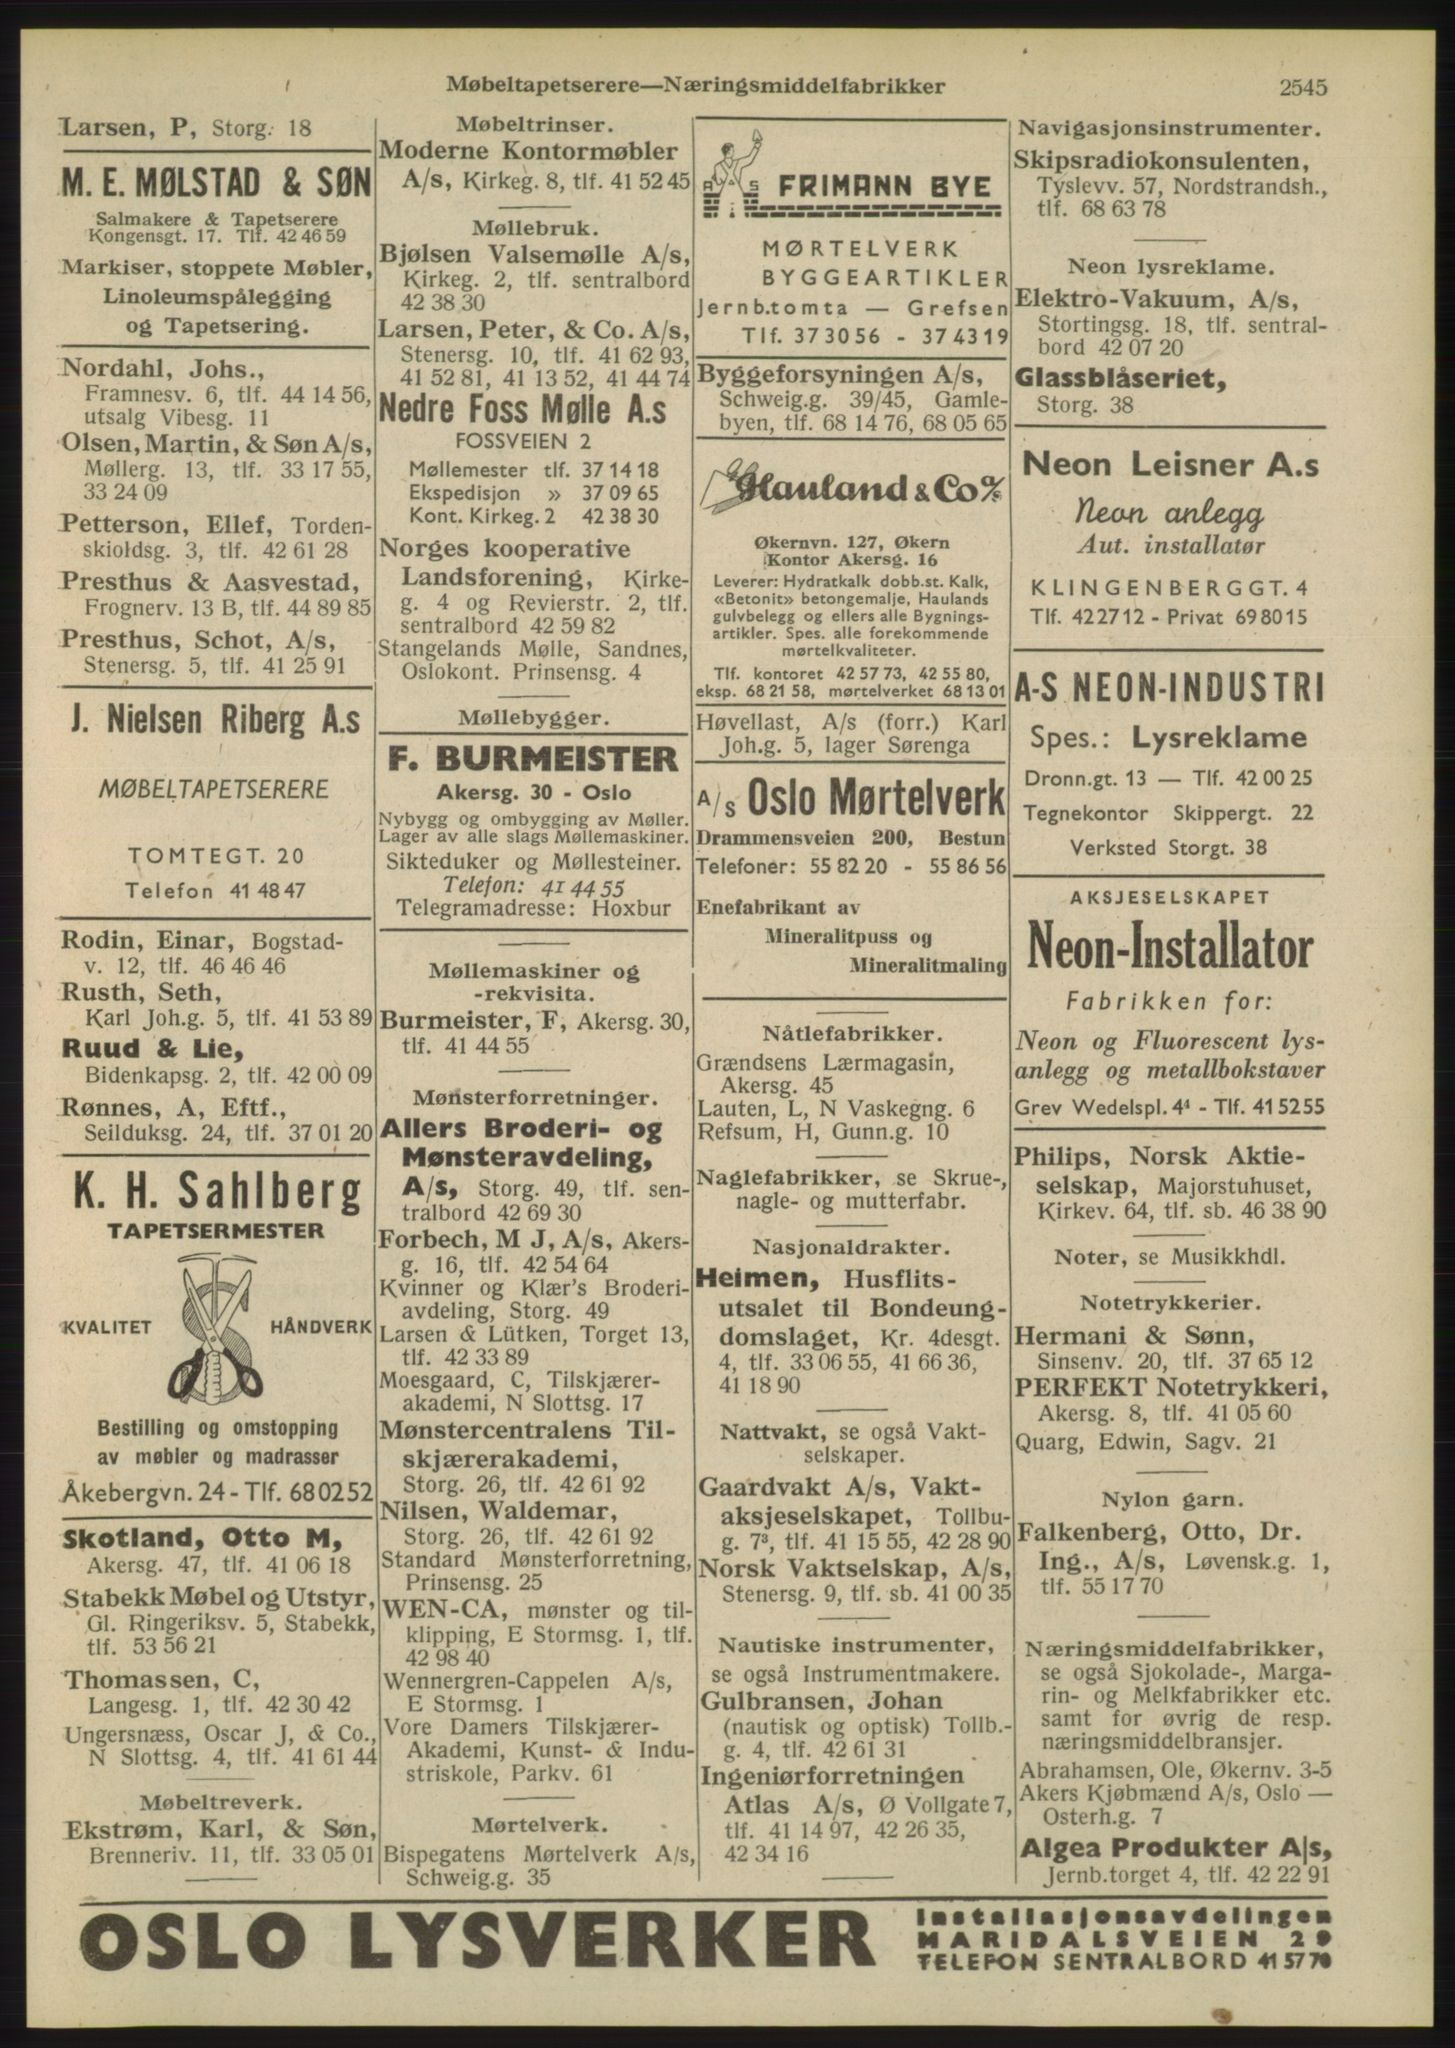 PUBL, Kristiania/Oslo adressebok, 1948, p. 2545